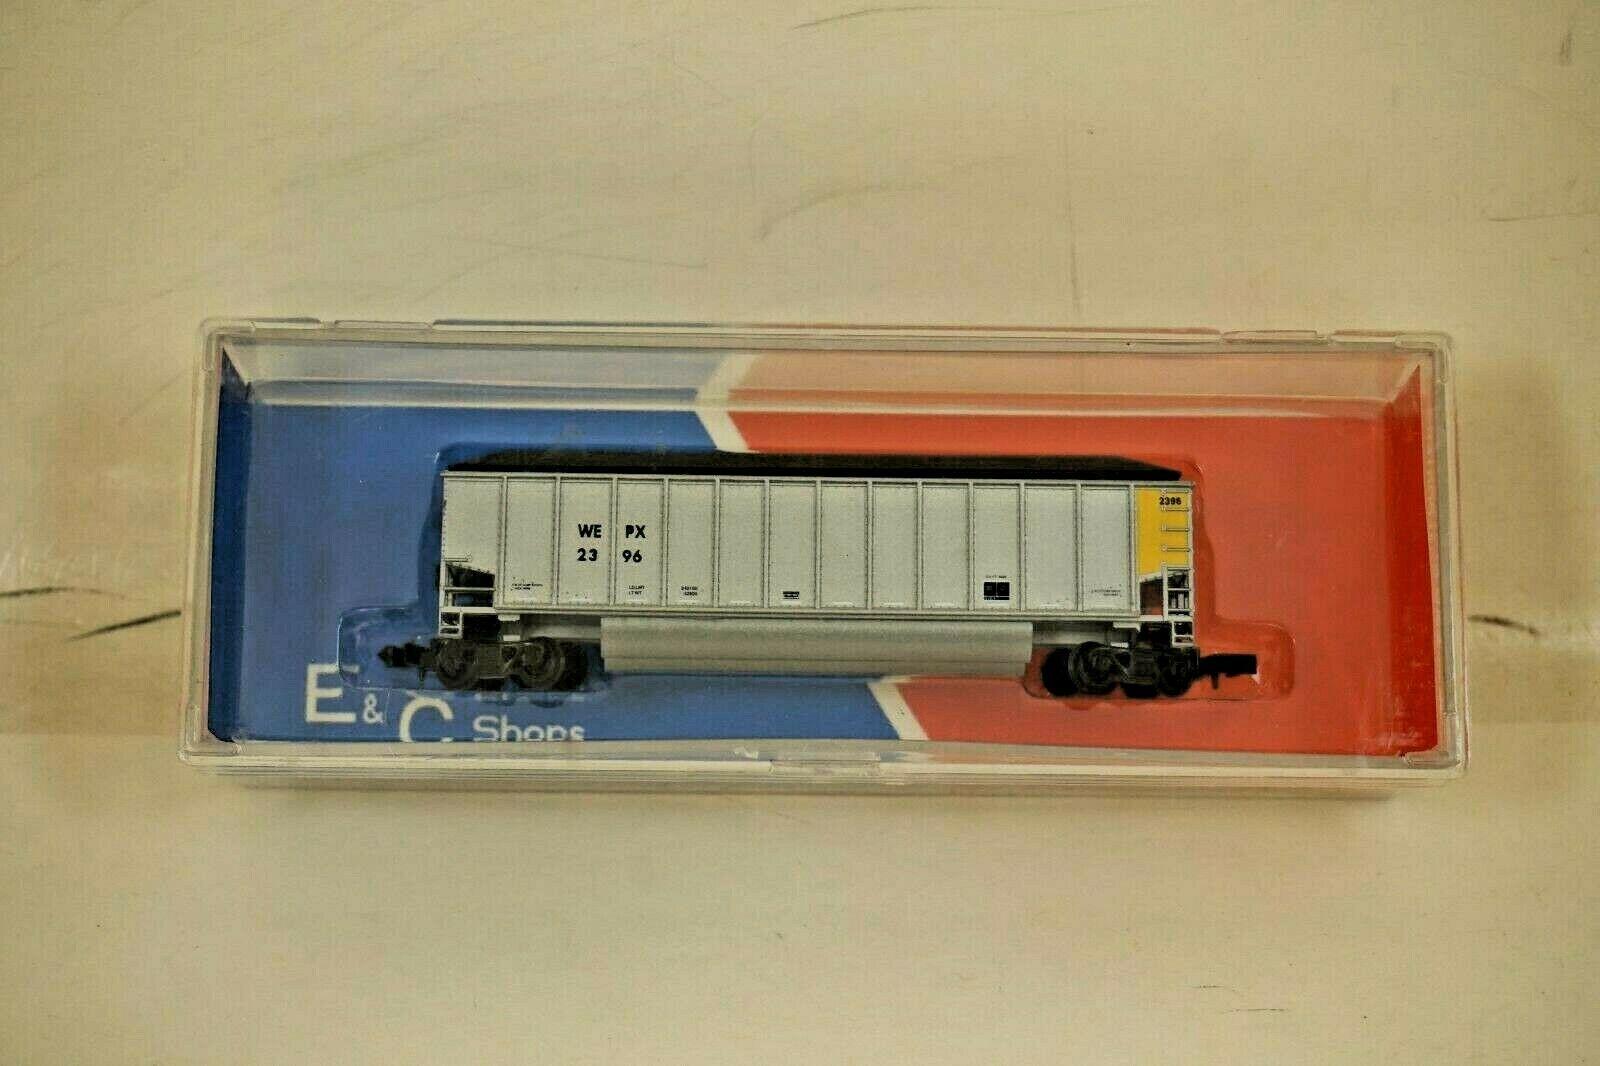 N Scale - E&C Shops - 715 - Gondola, Bathtub, Trinity Rotary  - Wisconsin Electric - 2396